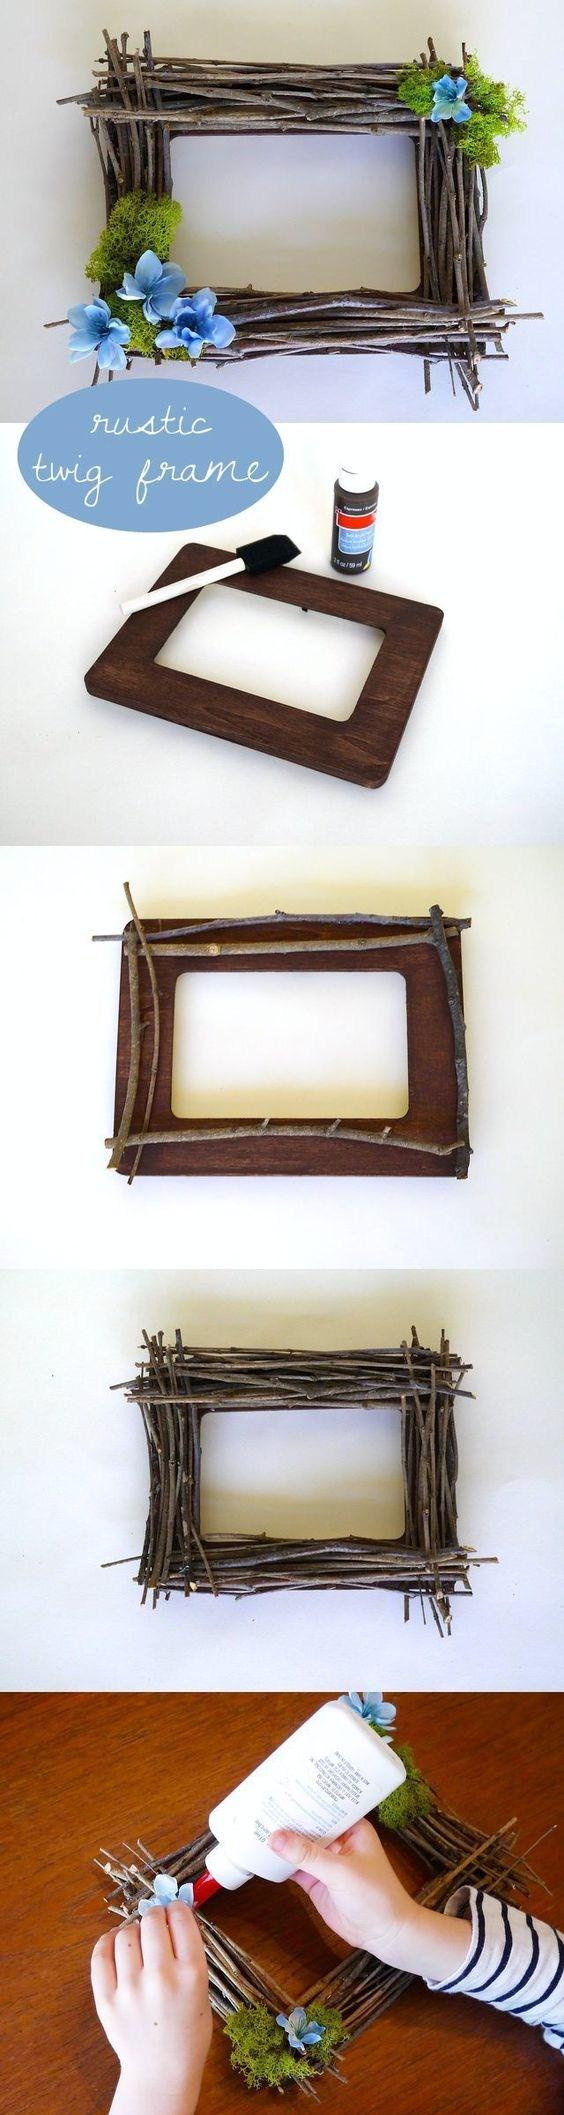 Una Buena Idea Decorativa-bebeazul.top (13)